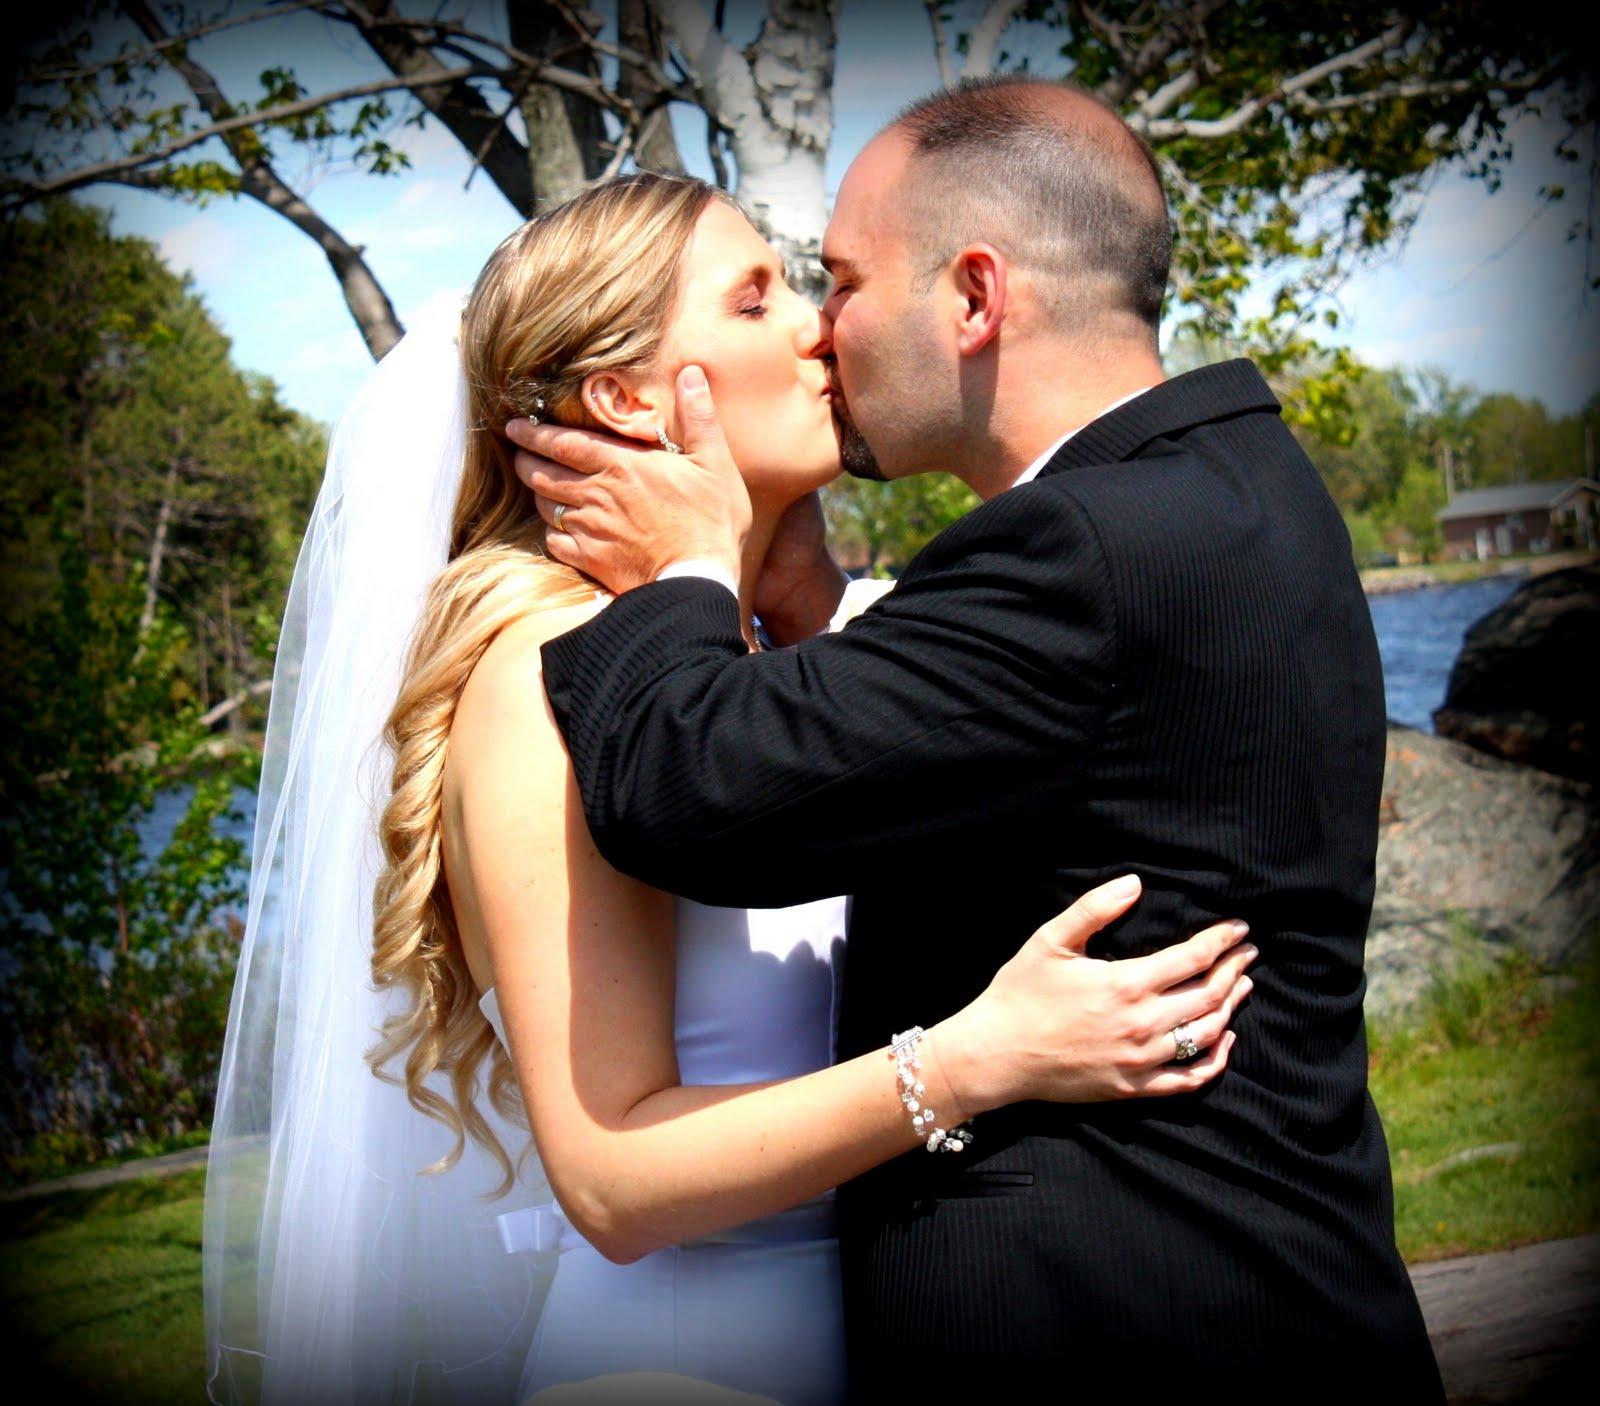 http://4.bp.blogspot.com/-m1lZuNjTdaU/TYveAKfiHVI/AAAAAAAAApE/ZfXQrkSwMJY/s1600/kiss.jpg